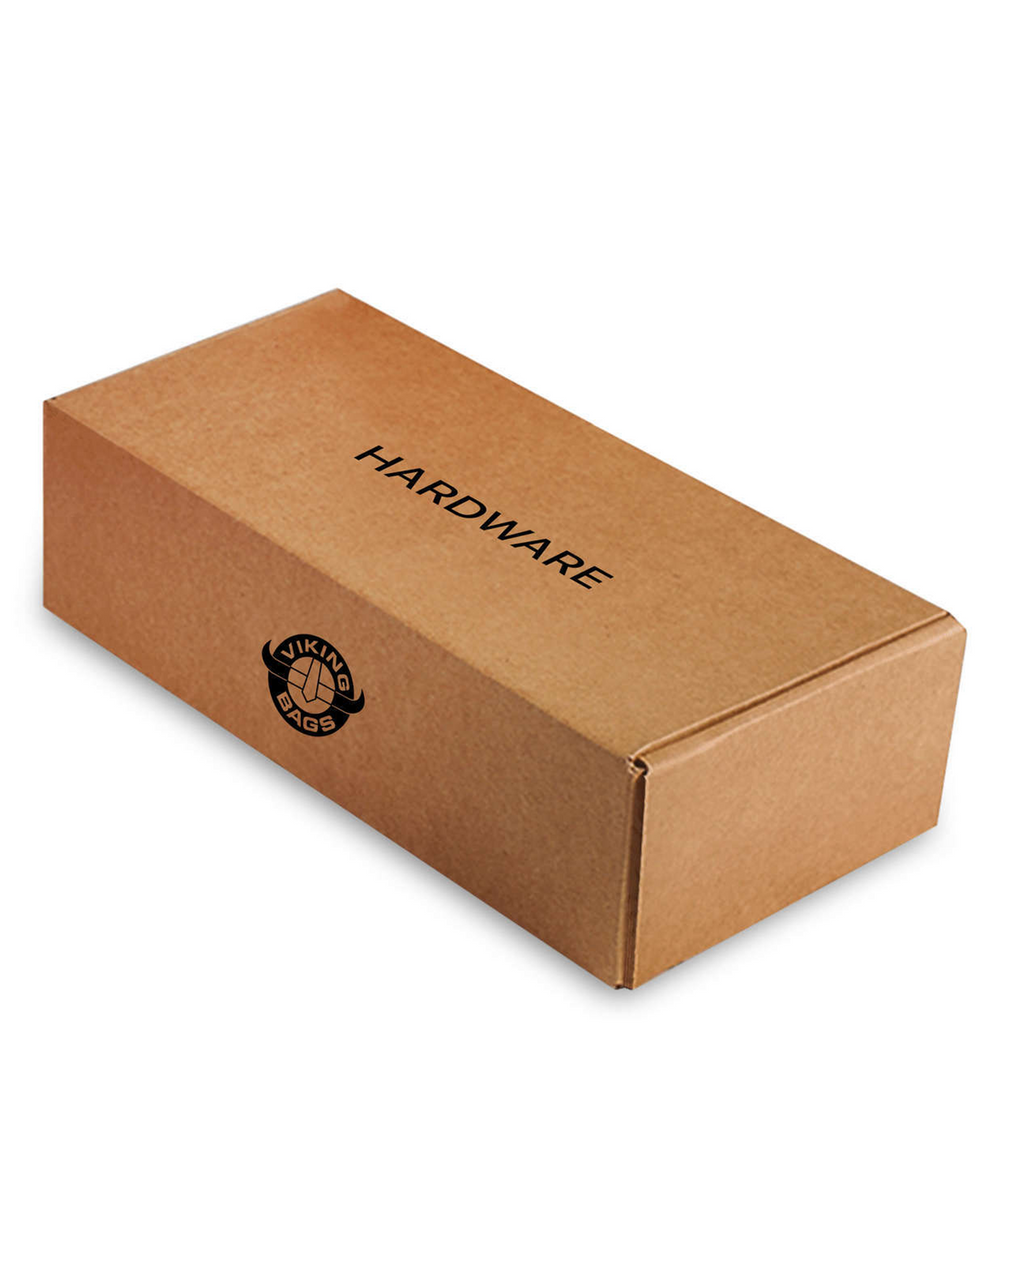 Honda VTX 1300 T Tourer Charger Side Pocket With Shock Cutout Motorcycle Saddlebags Hardware Box